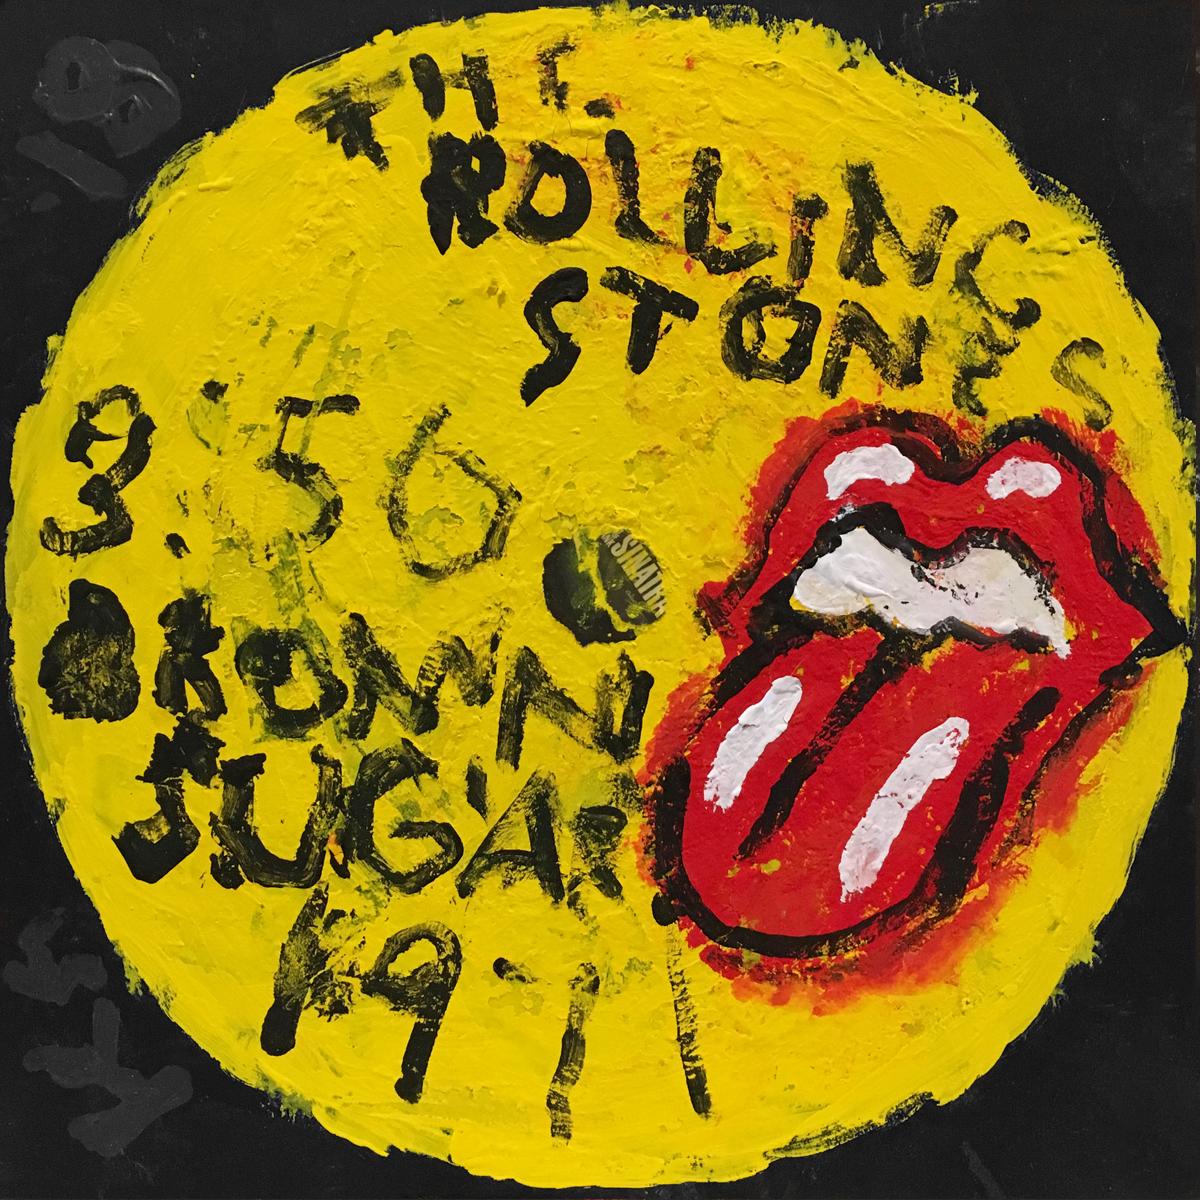 Rolling Stones / Brown sugar #2